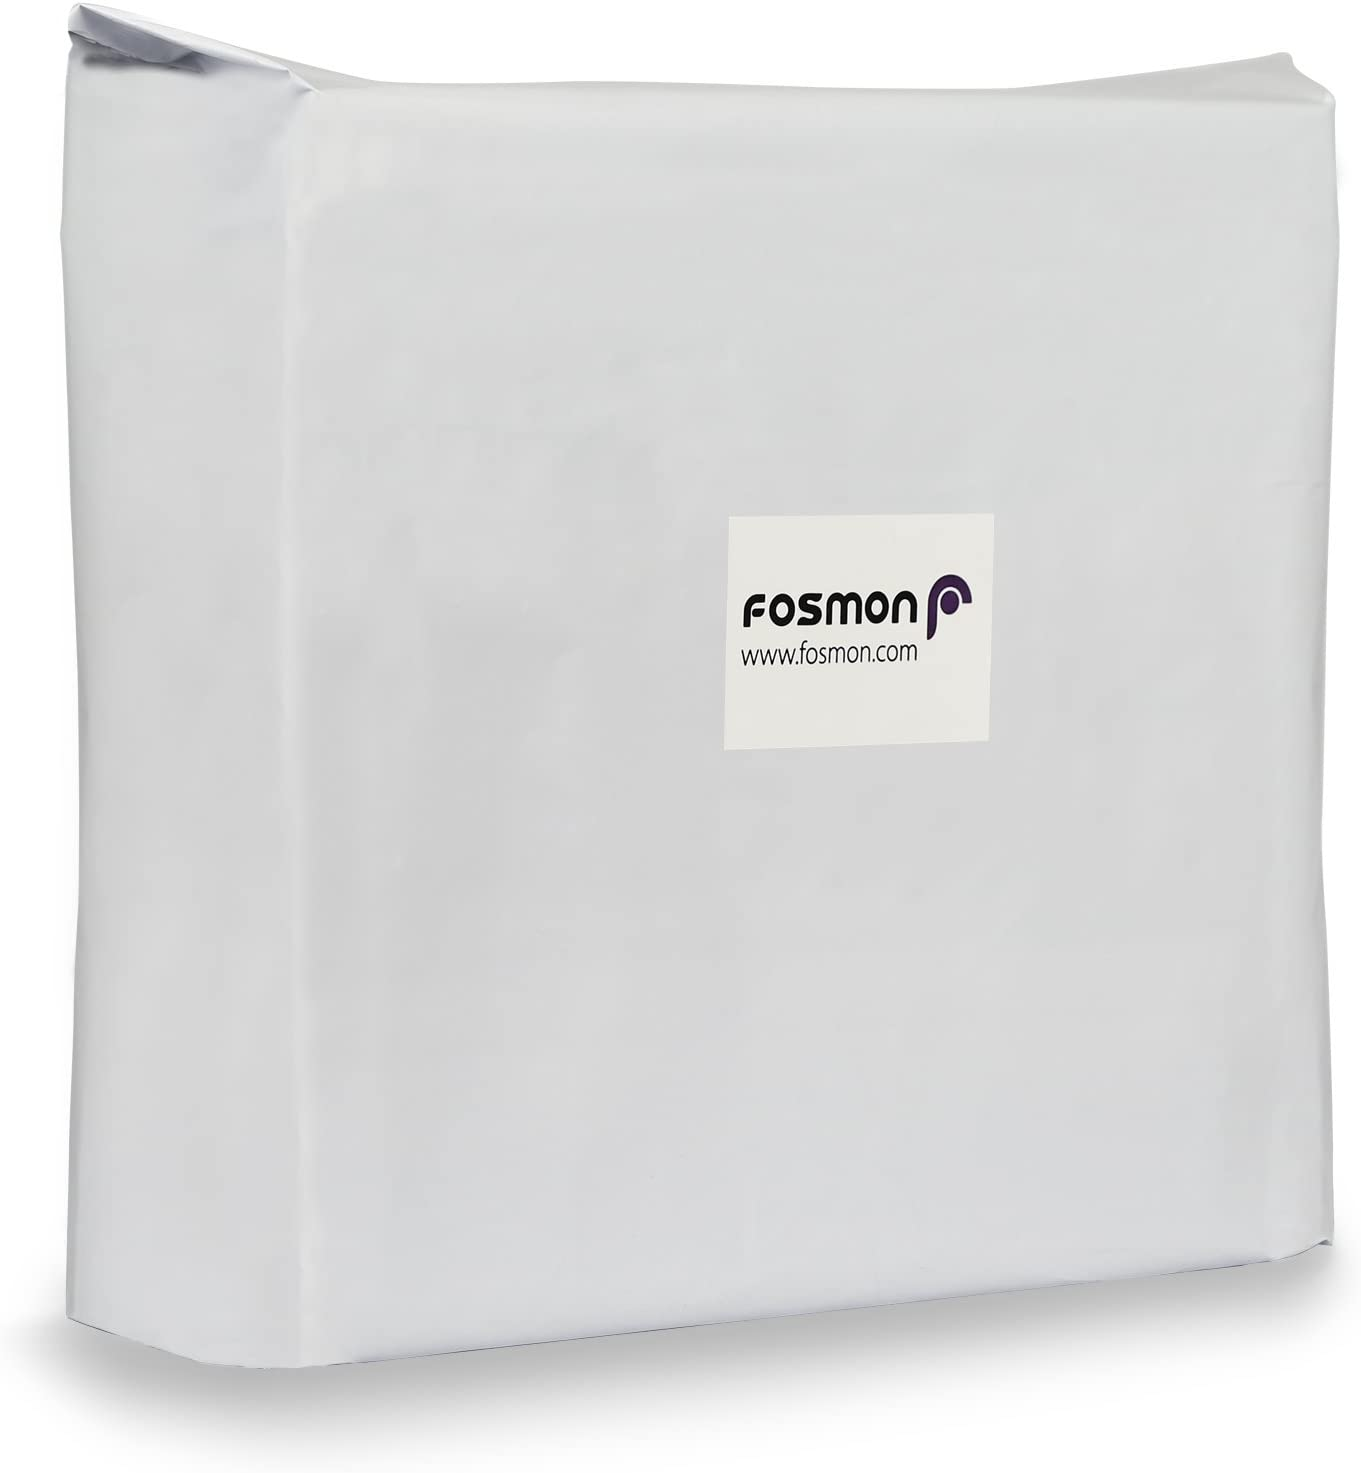 25 25-30x36 Fosmon Large Self-Seal Tear-Proof Polyethylene Mailers